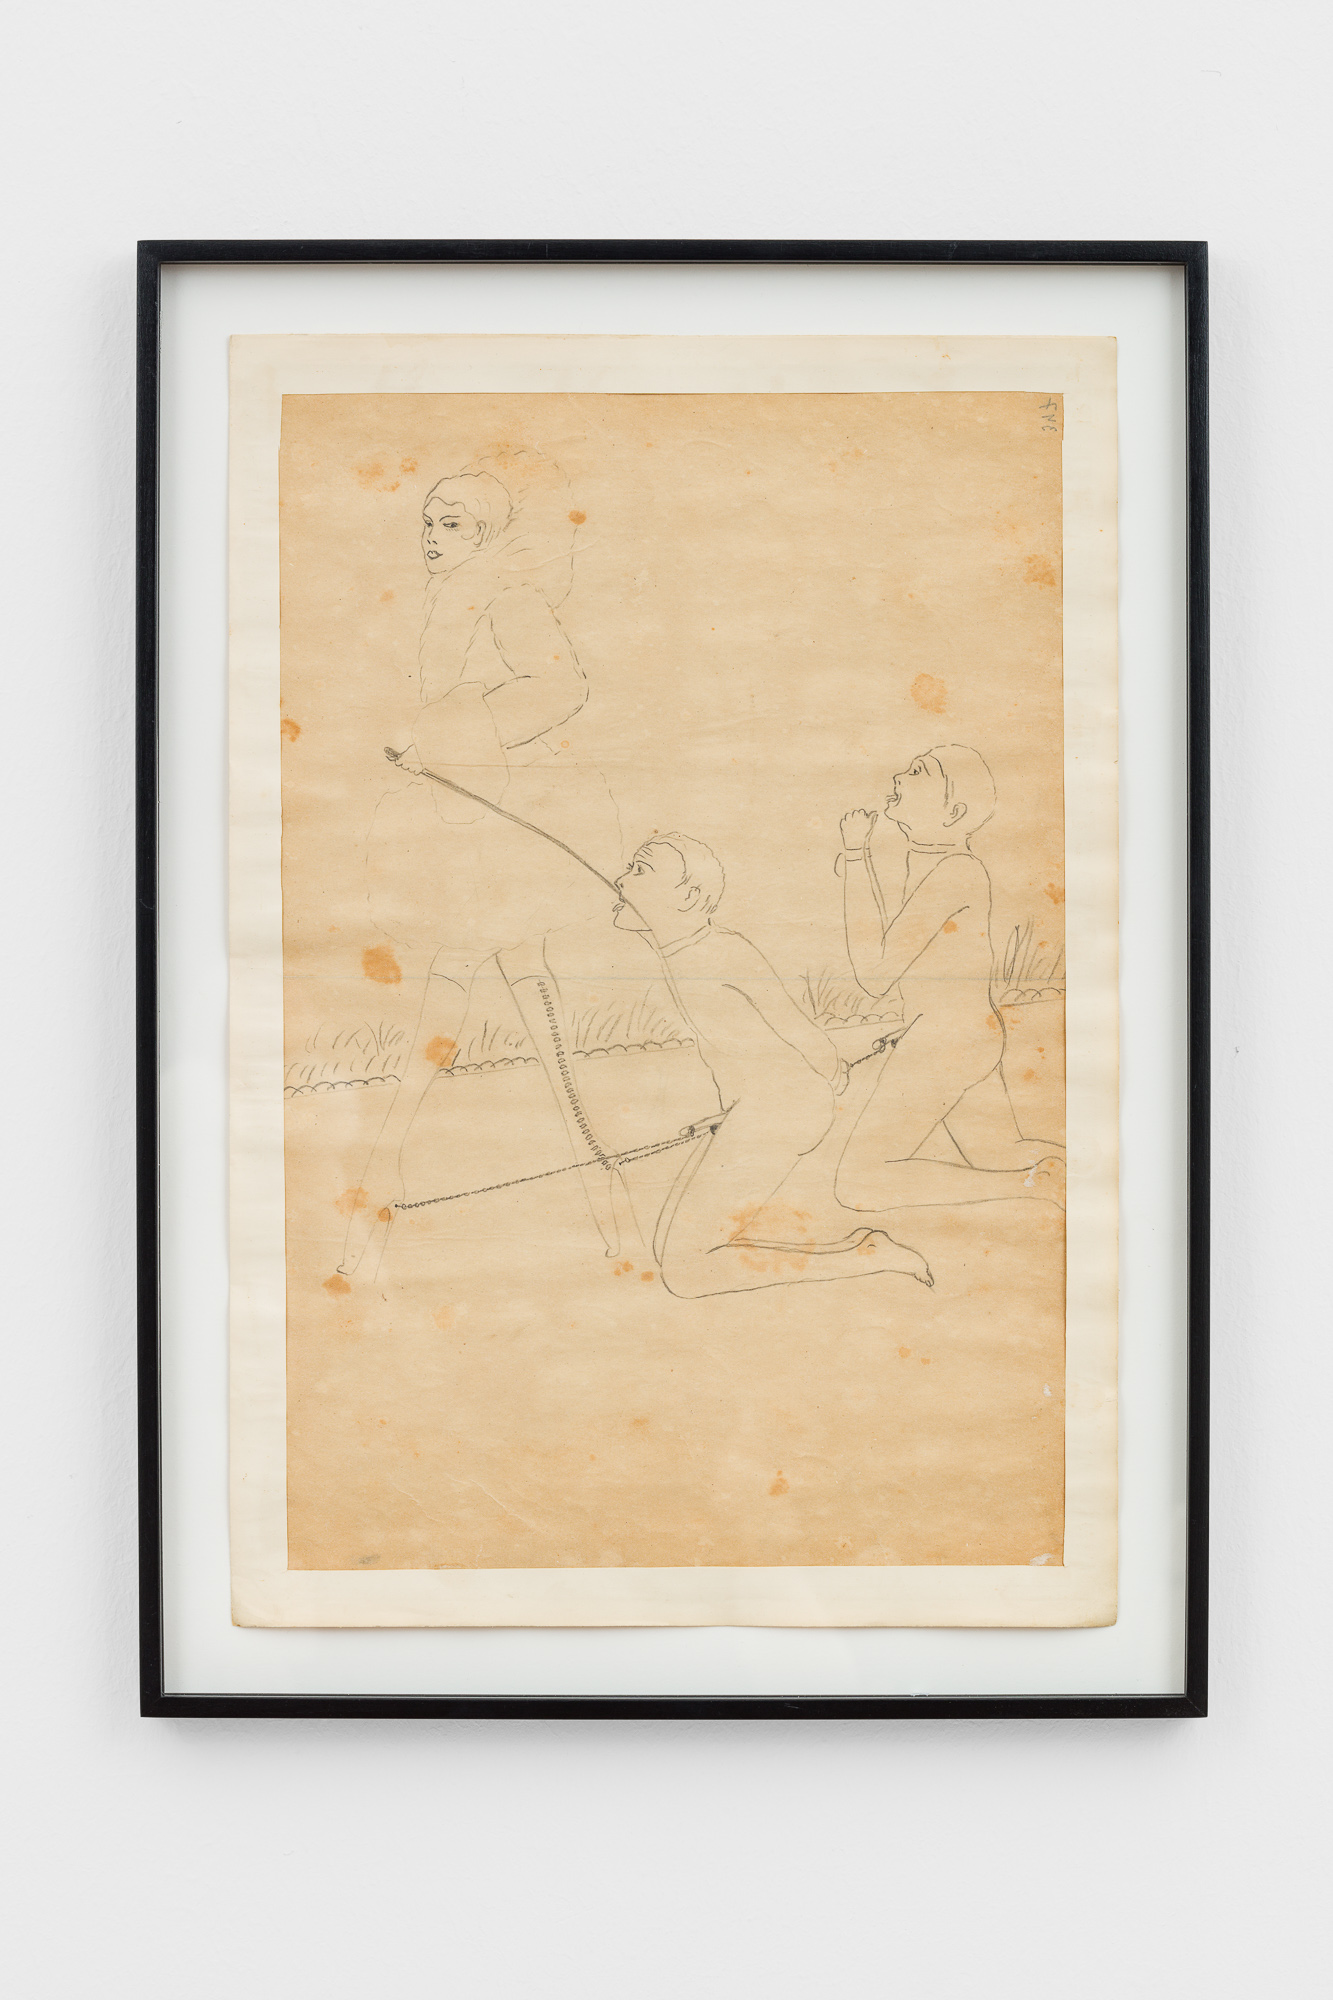 2018_11_22_Reproduktionen_Zoe Barcza & Soshiro Matsubara at Croy Nielsen by kunstdokumentationcom_004_web.jpg